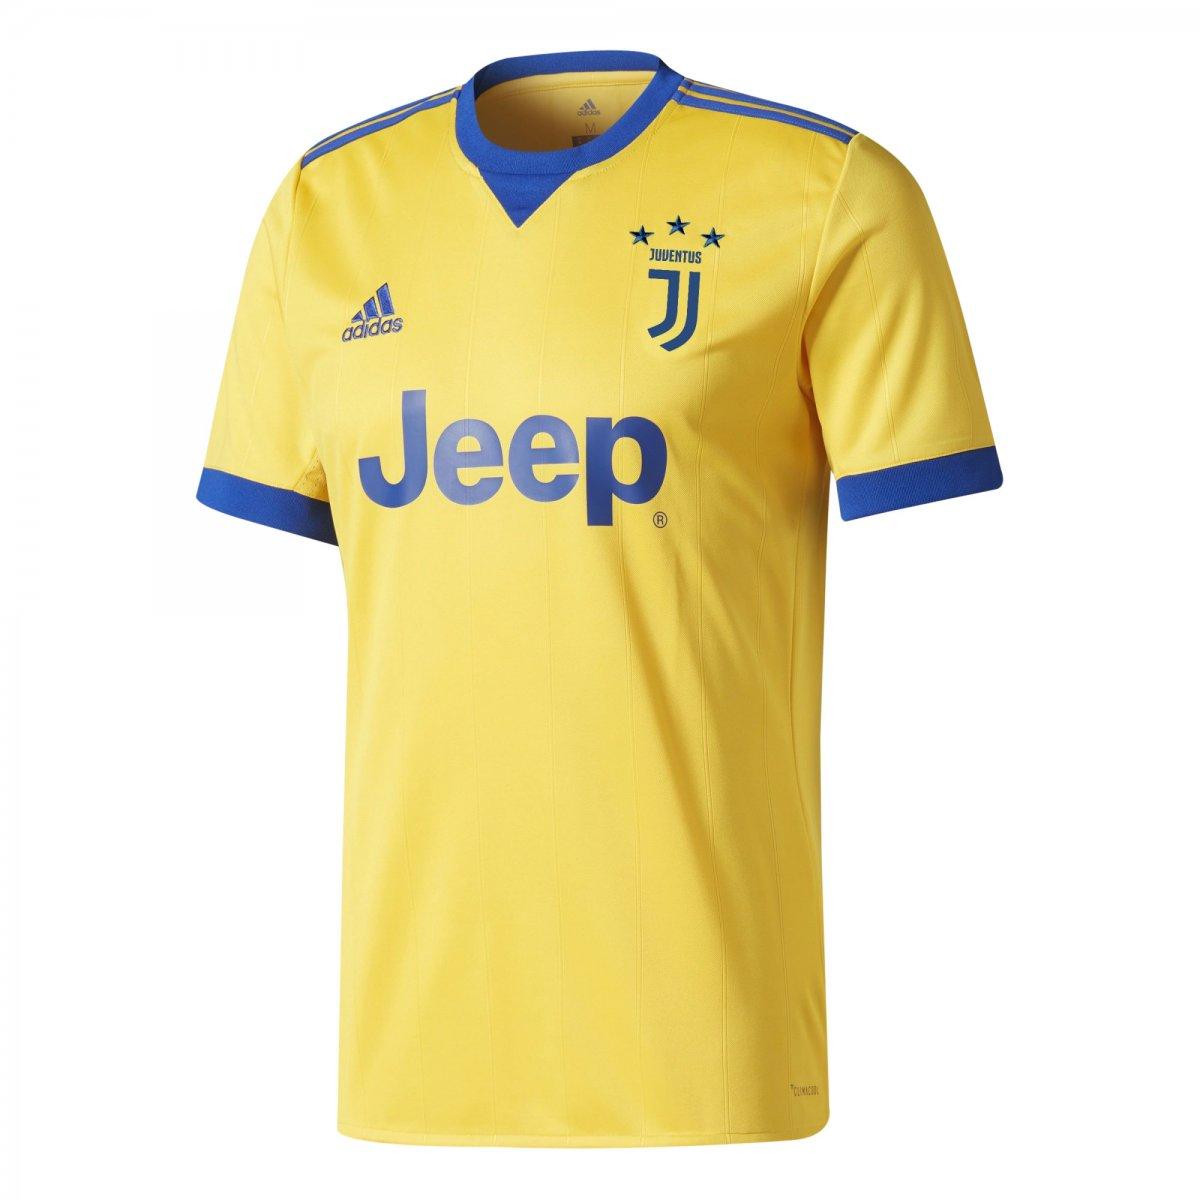 b0c102a52 Camiseta Adidas Juventus II BQ4530 - Amarelo Azul - Botas Online ...